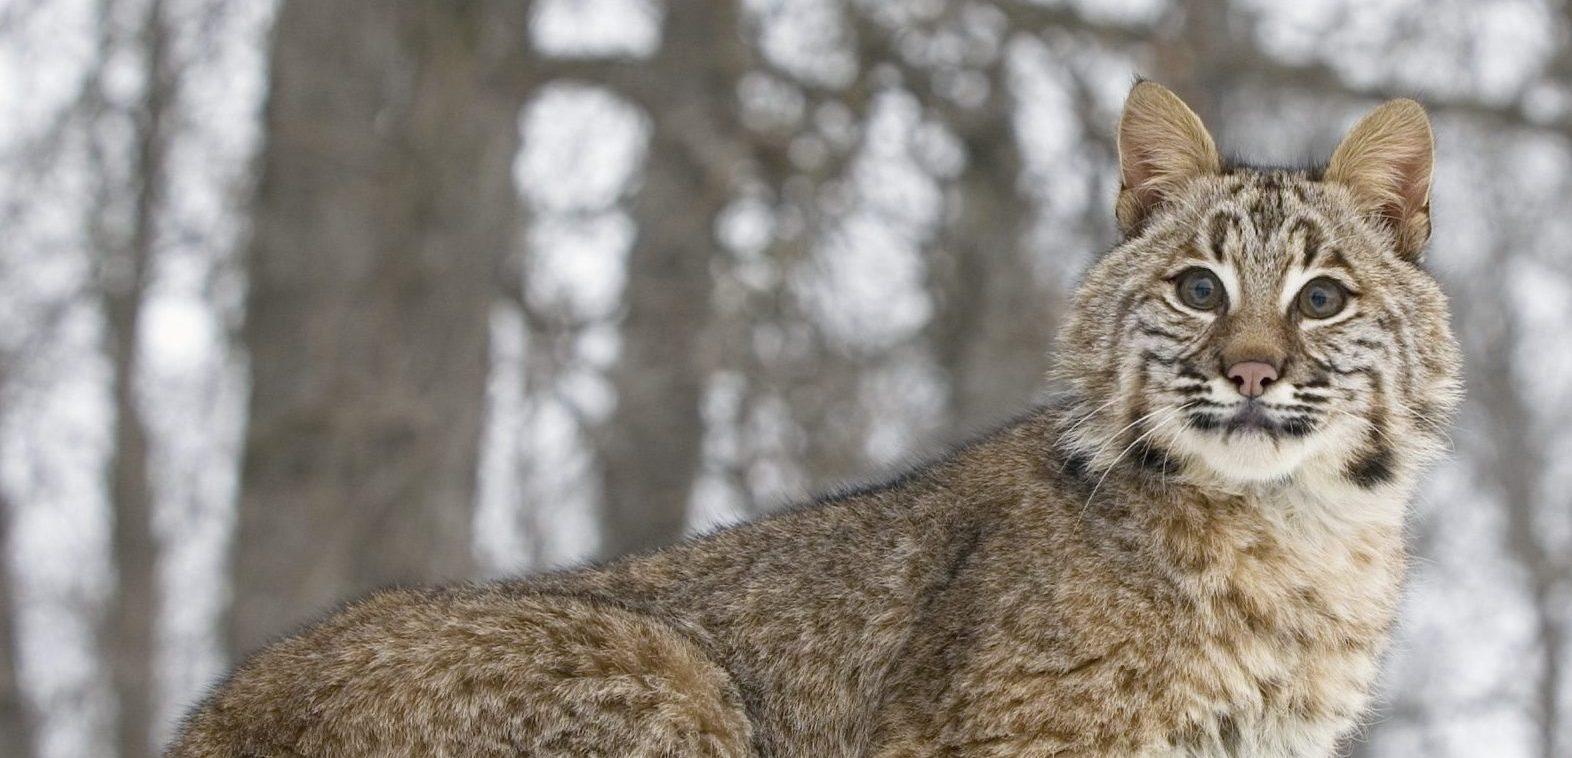 Bobcat in tree,telephoto shot